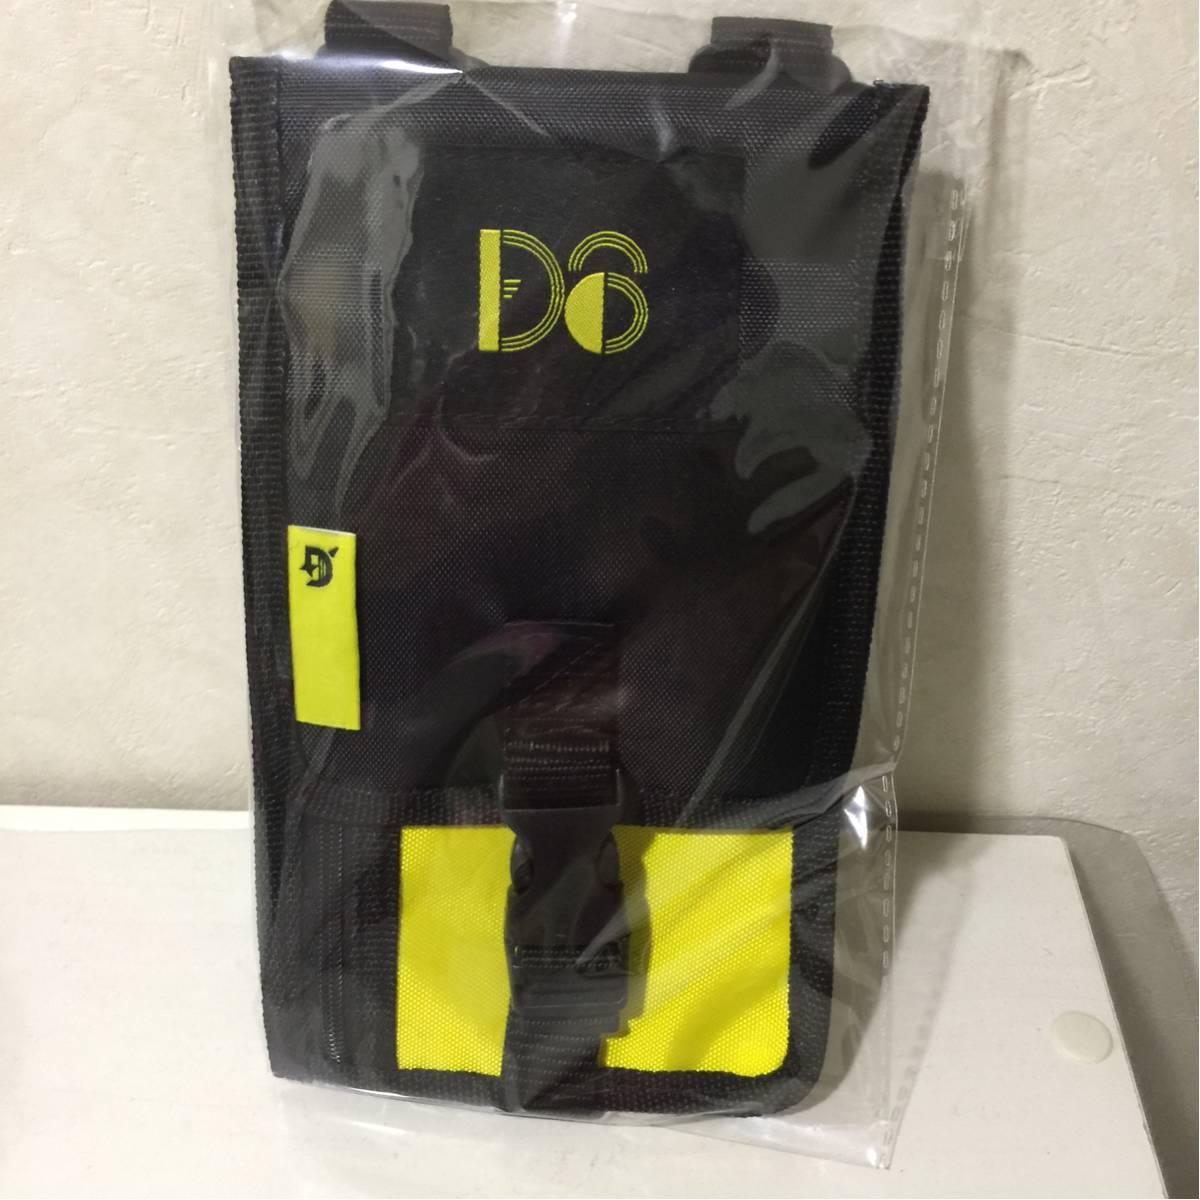 DOBERMAN INFINITY★オフィシャル ファンクラブ 特典★D6限定マルチケース